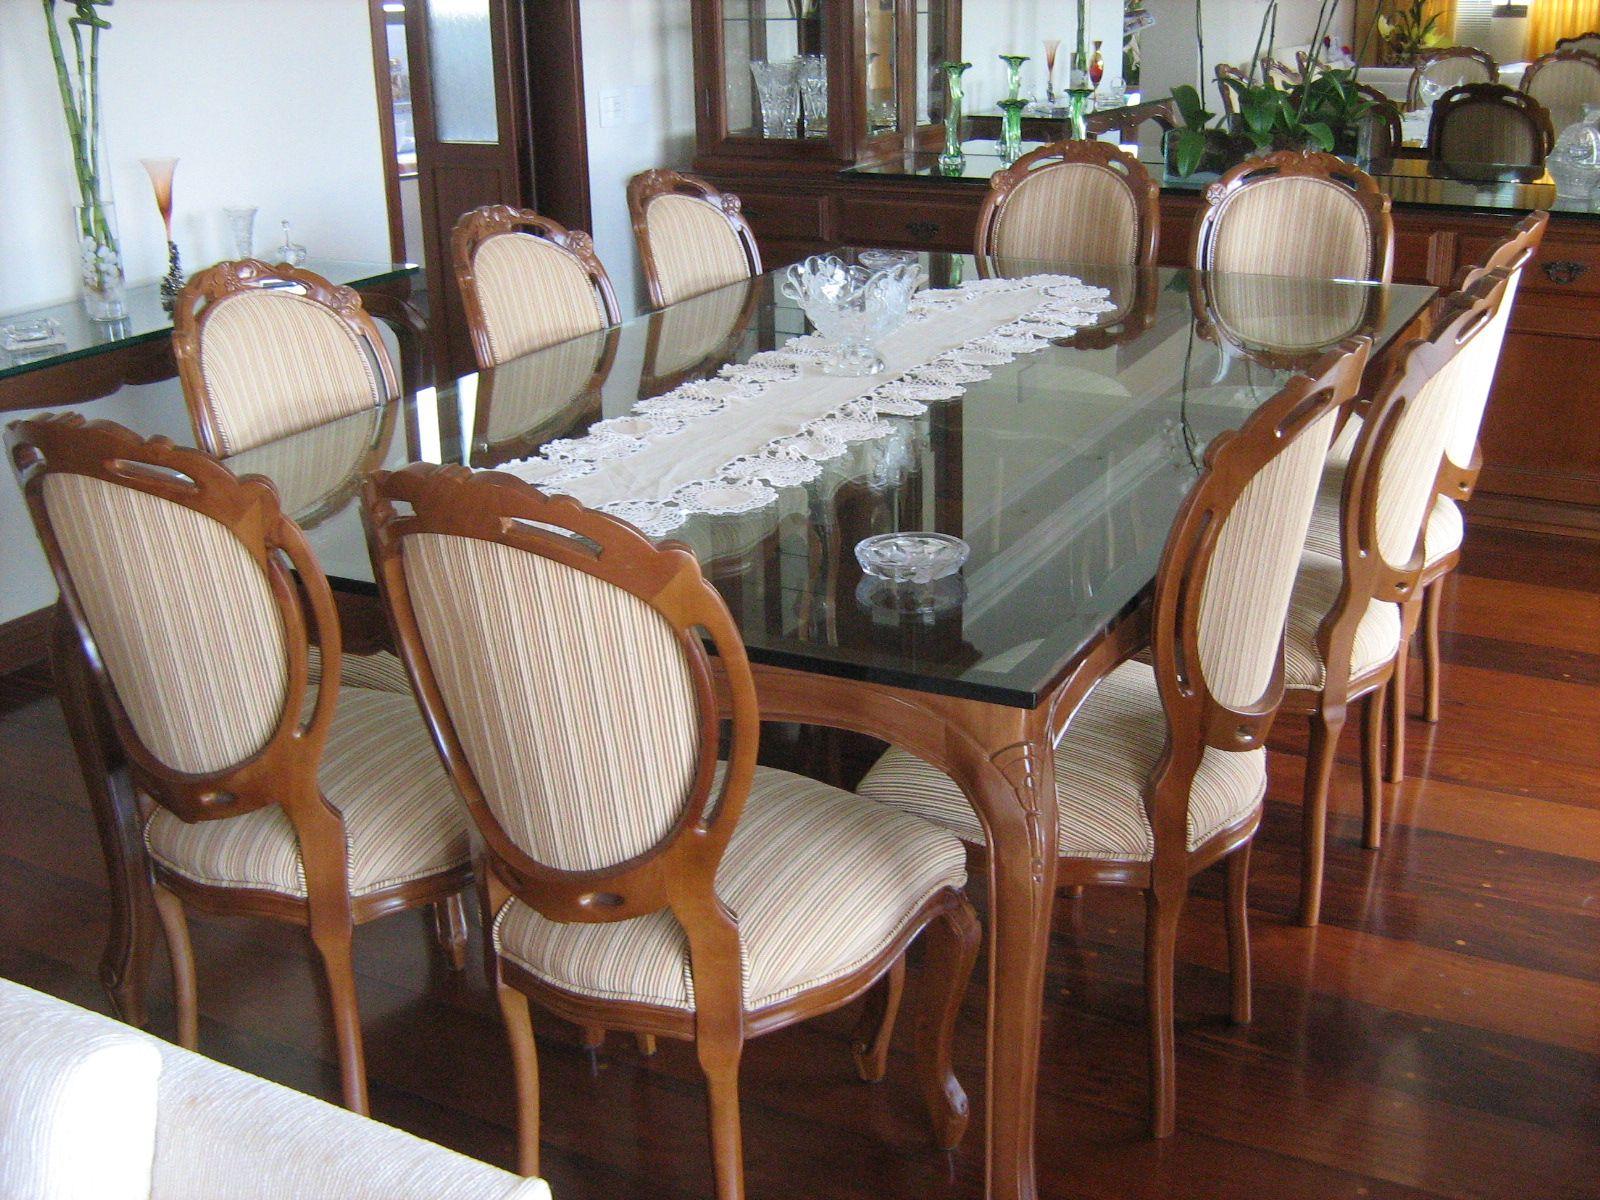 Sala De Jantar Usada Sp ~  Salas de Jantar  Pinterest  Cadeira medalhão, Sala de jantar de